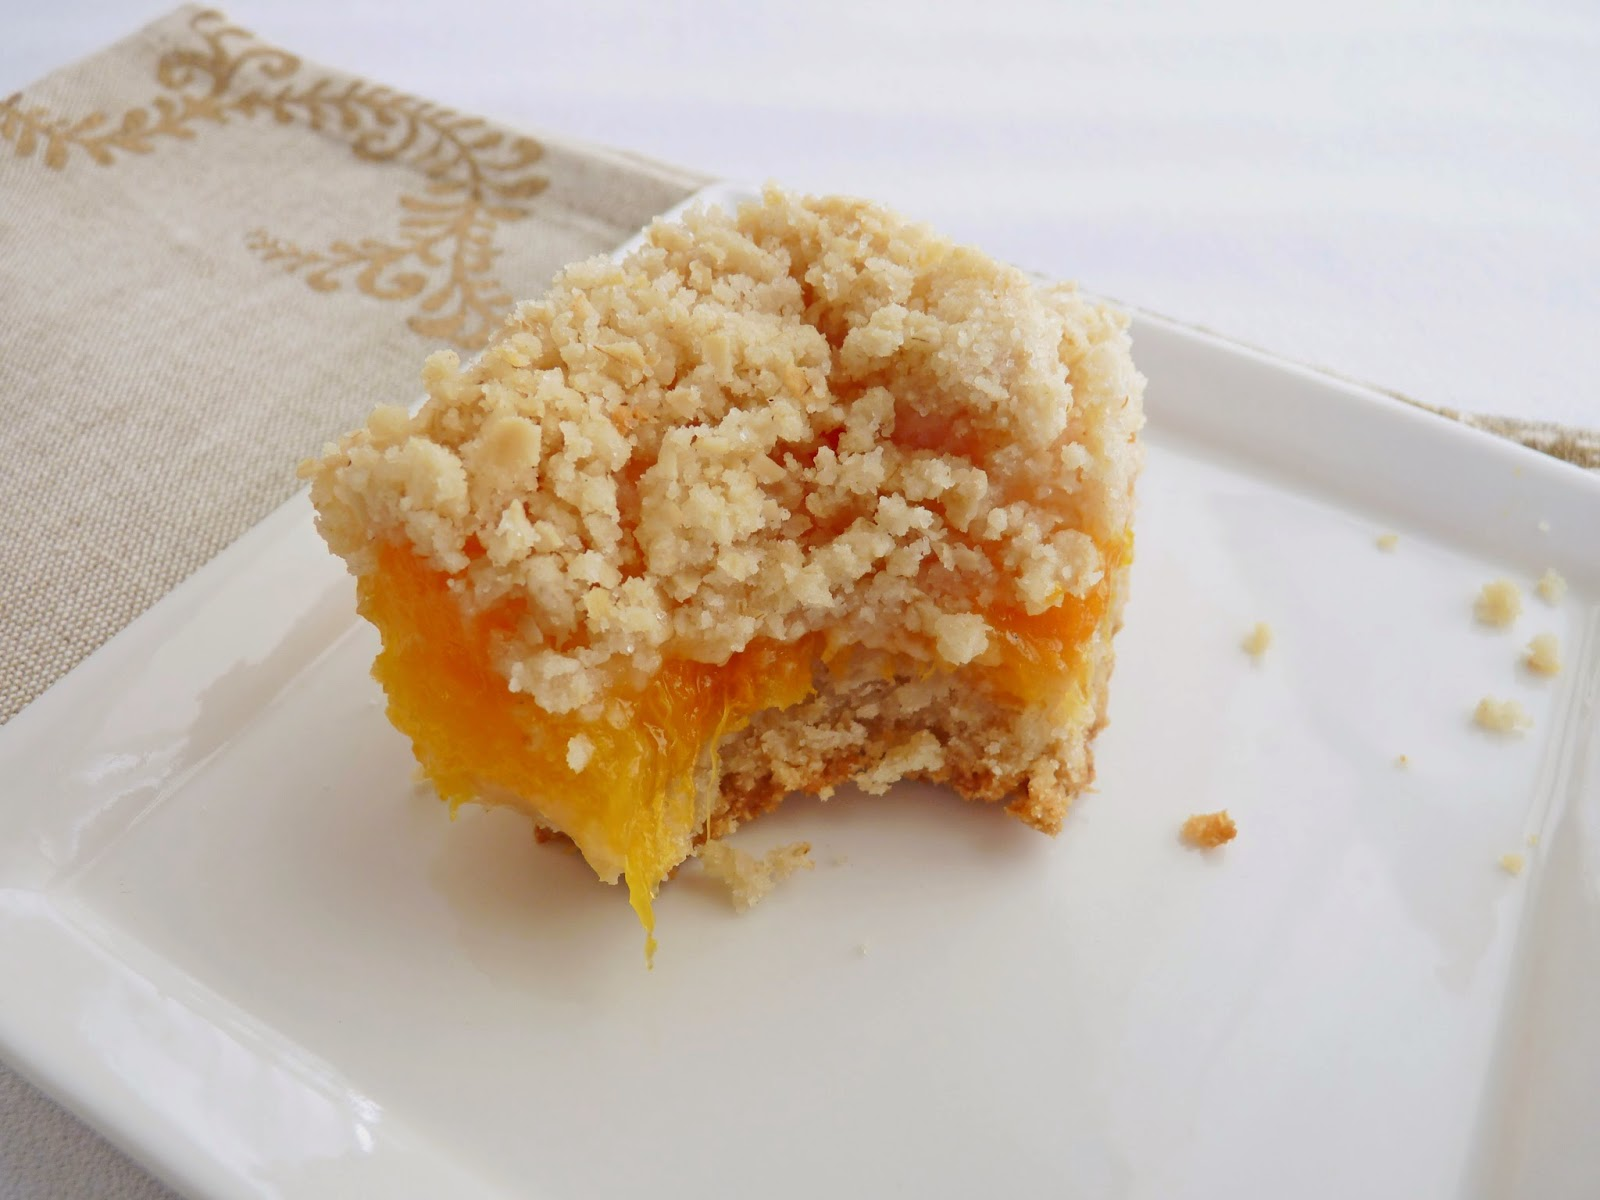 pastry studio: Apricot Oatmeal Bars